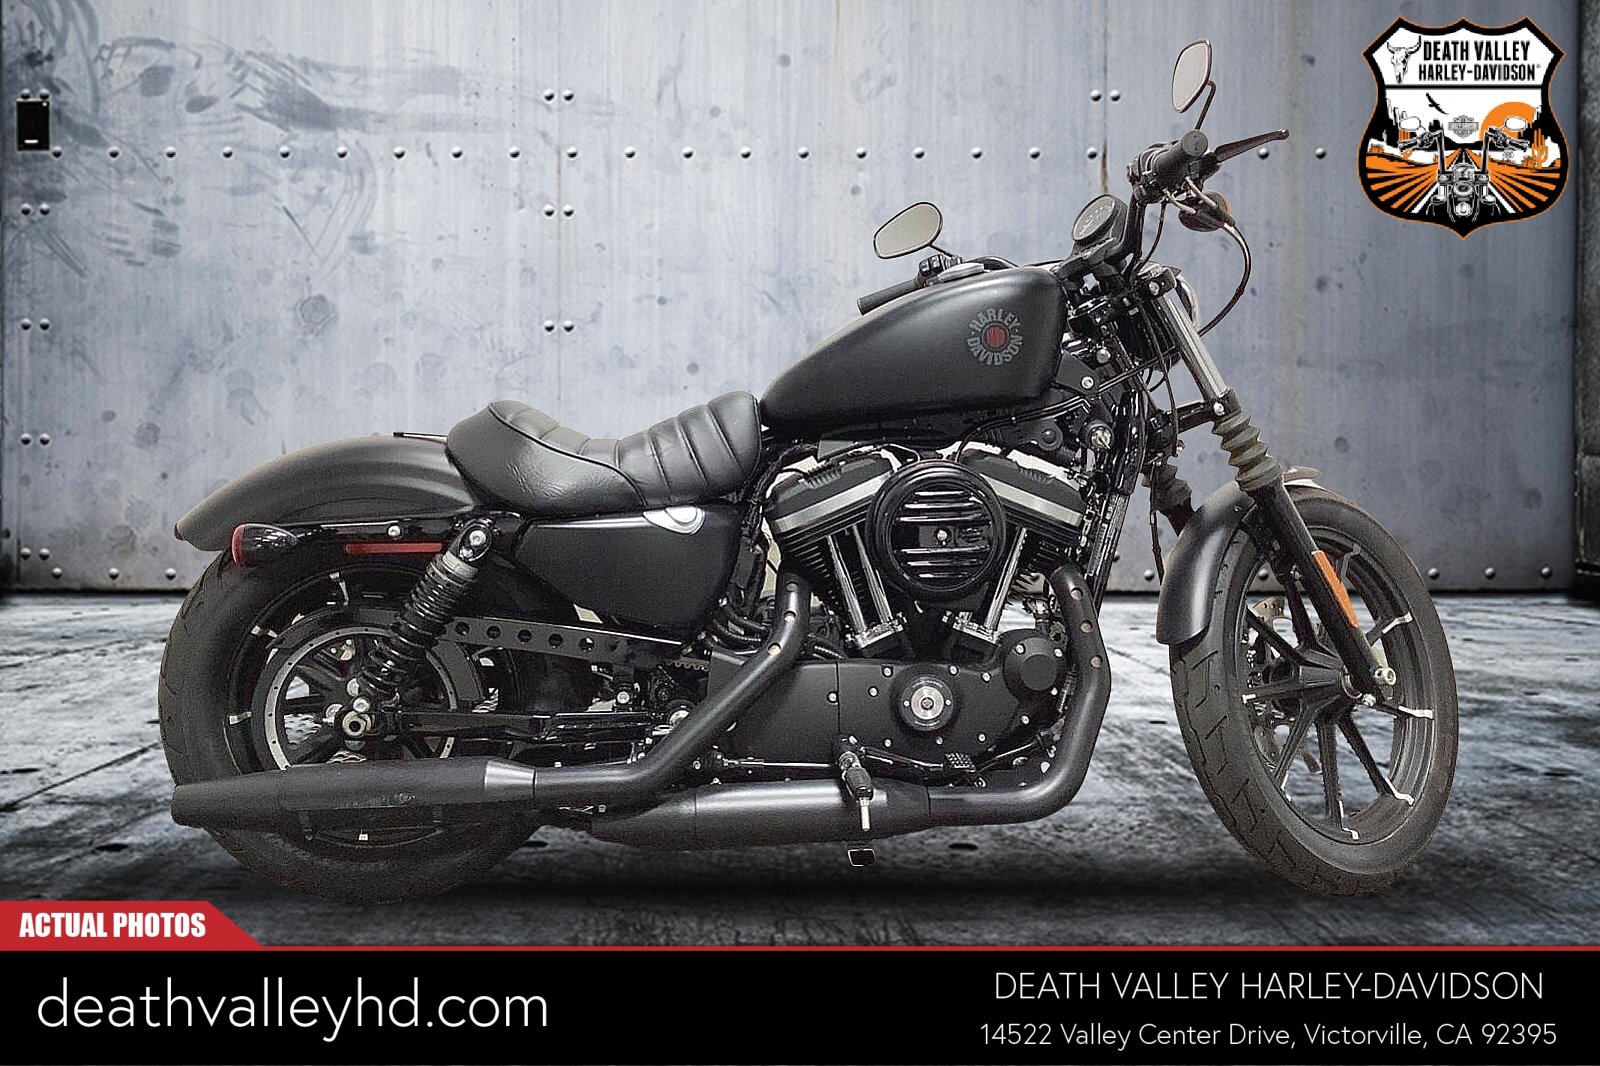 2020 Harley-Davidson Iron 883 [1]